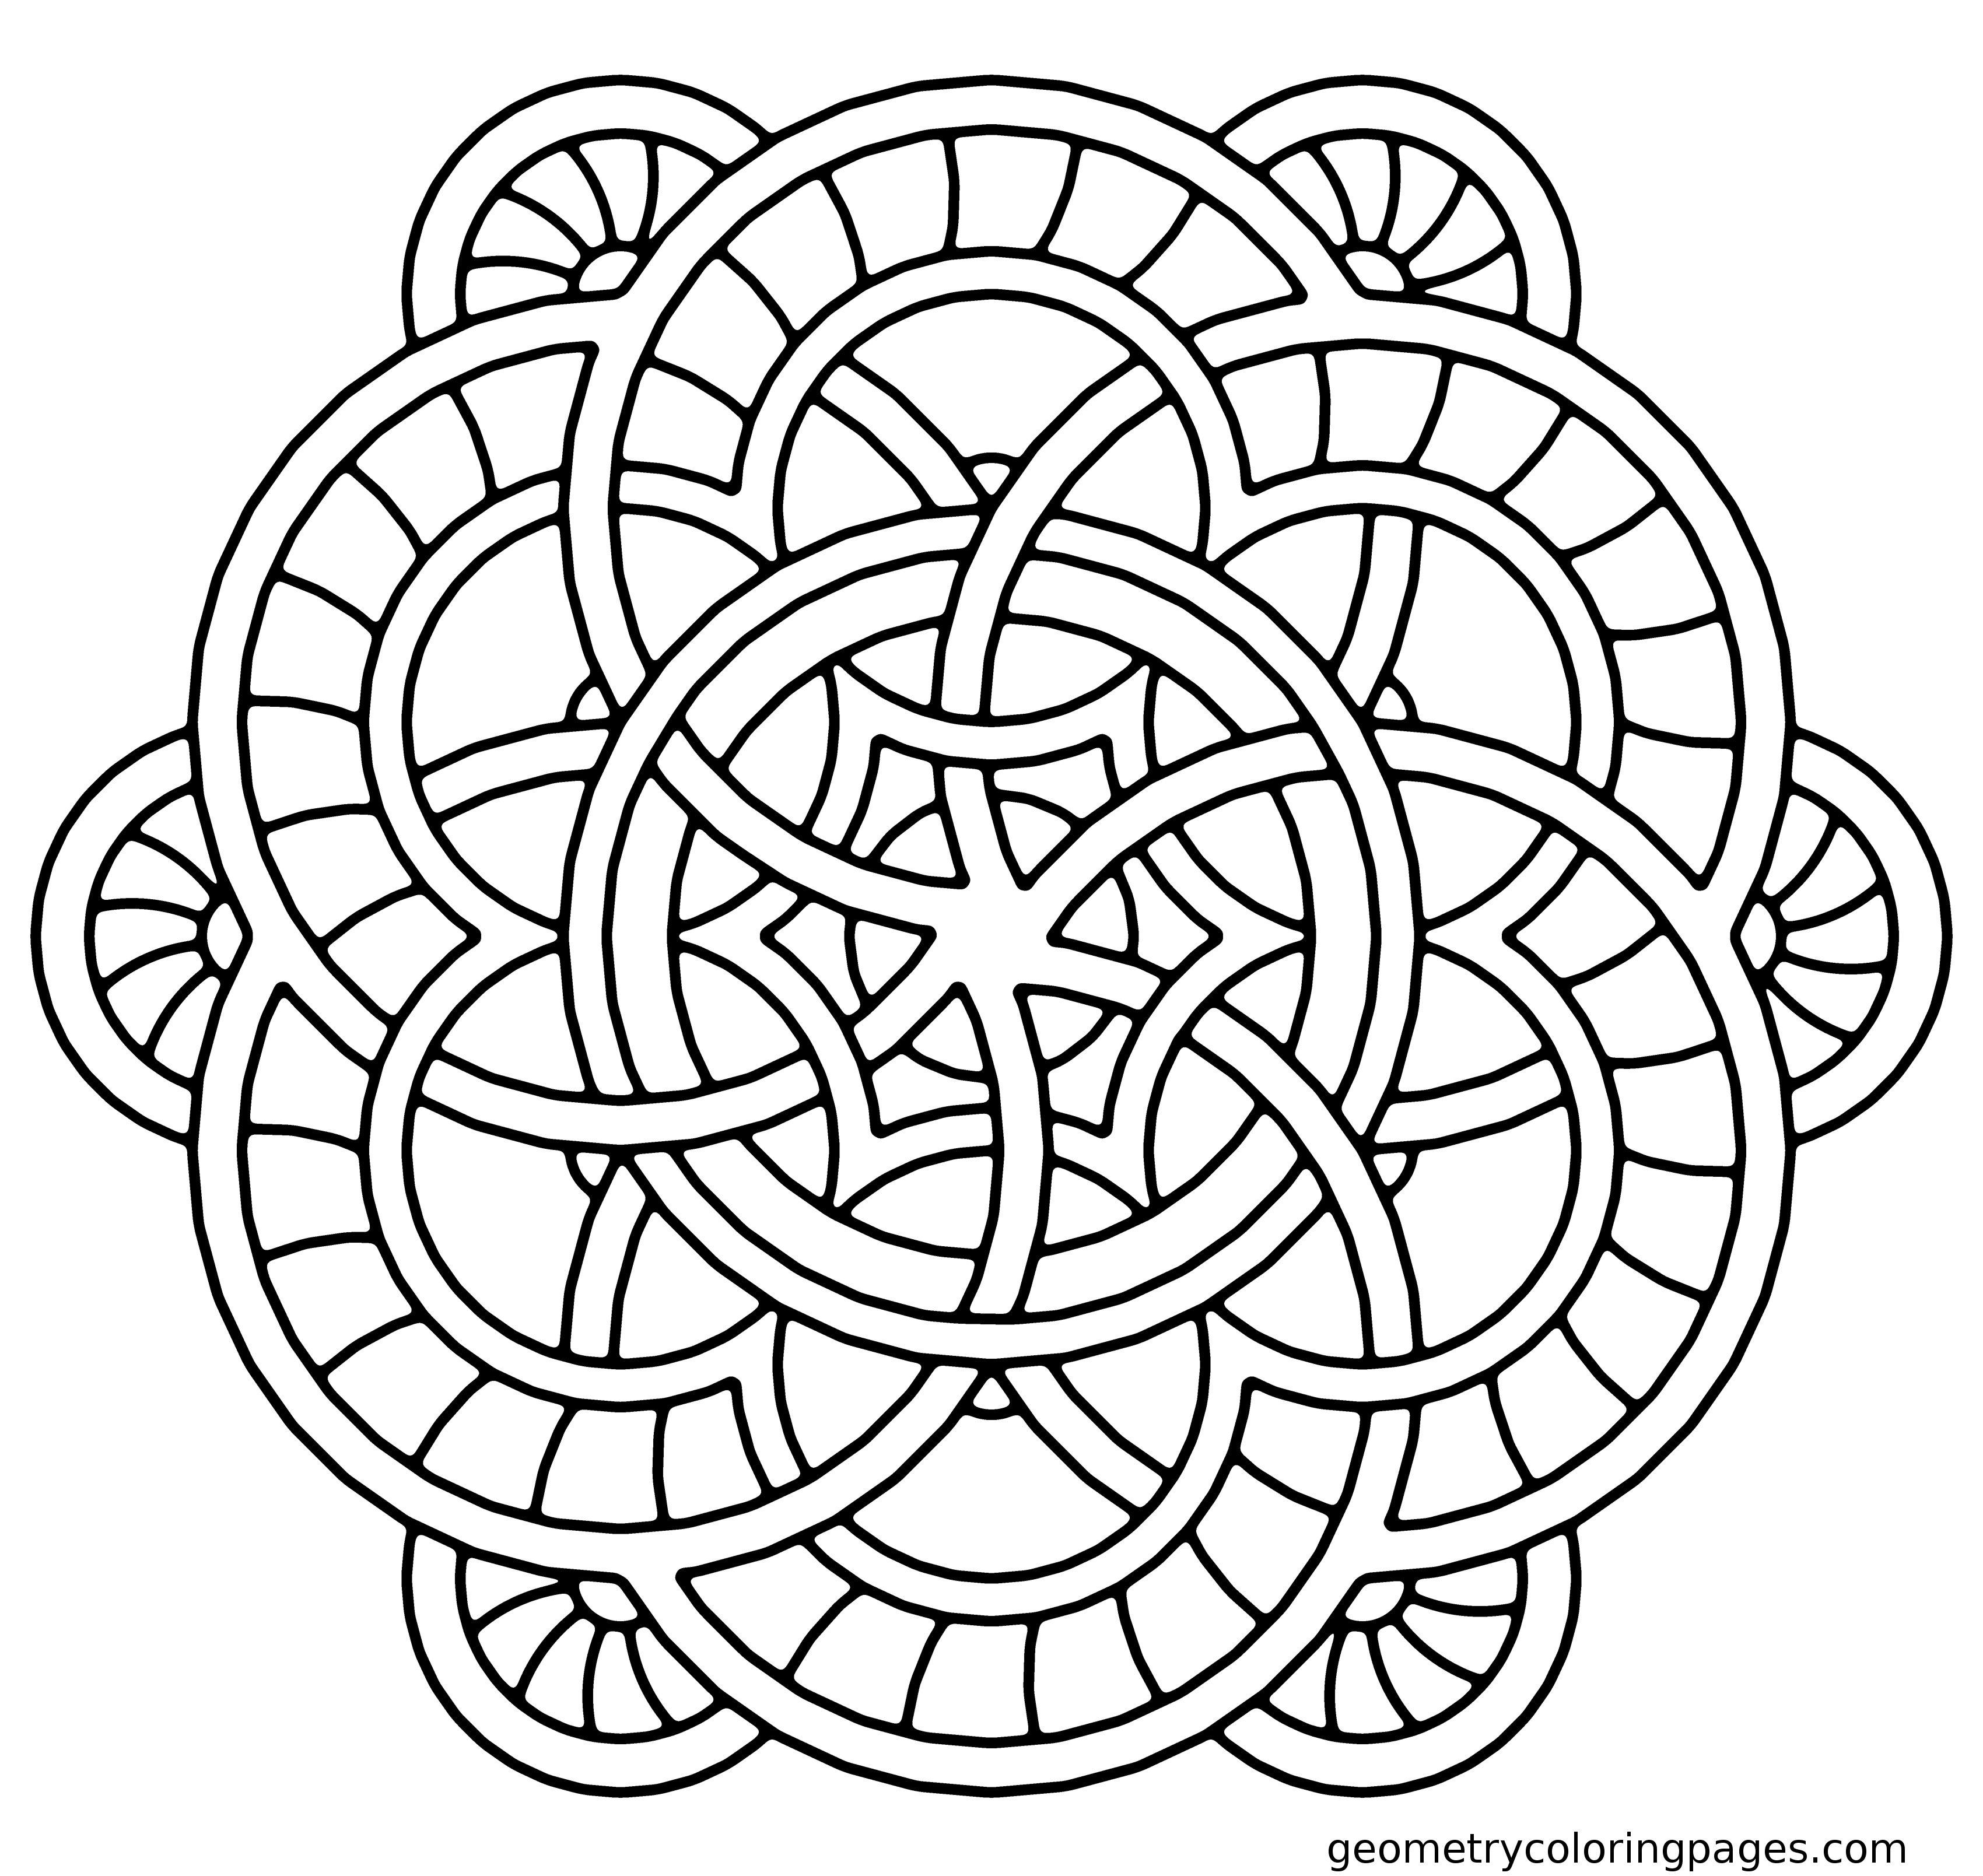 simple mandalas simple mandala with flower coloring page free printable simple mandalas